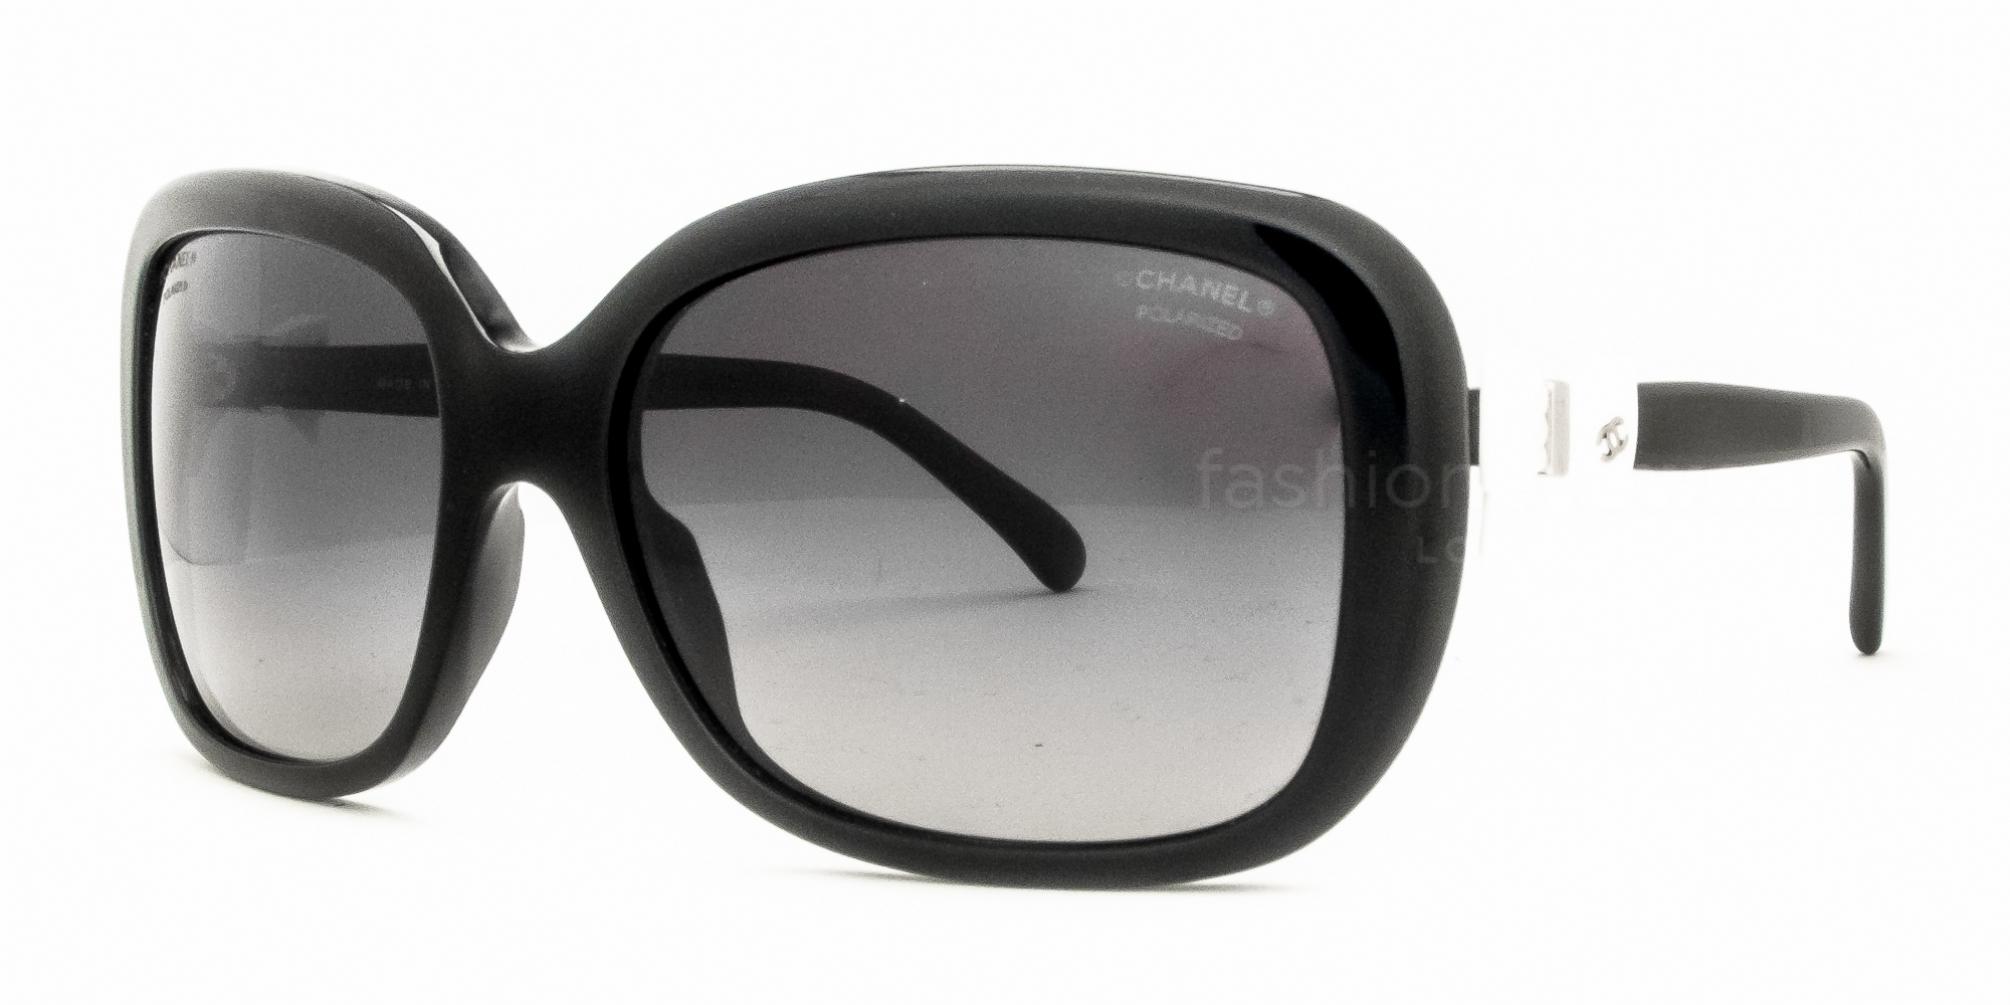 b048ffa787 Chanel 5171 Sunglasses